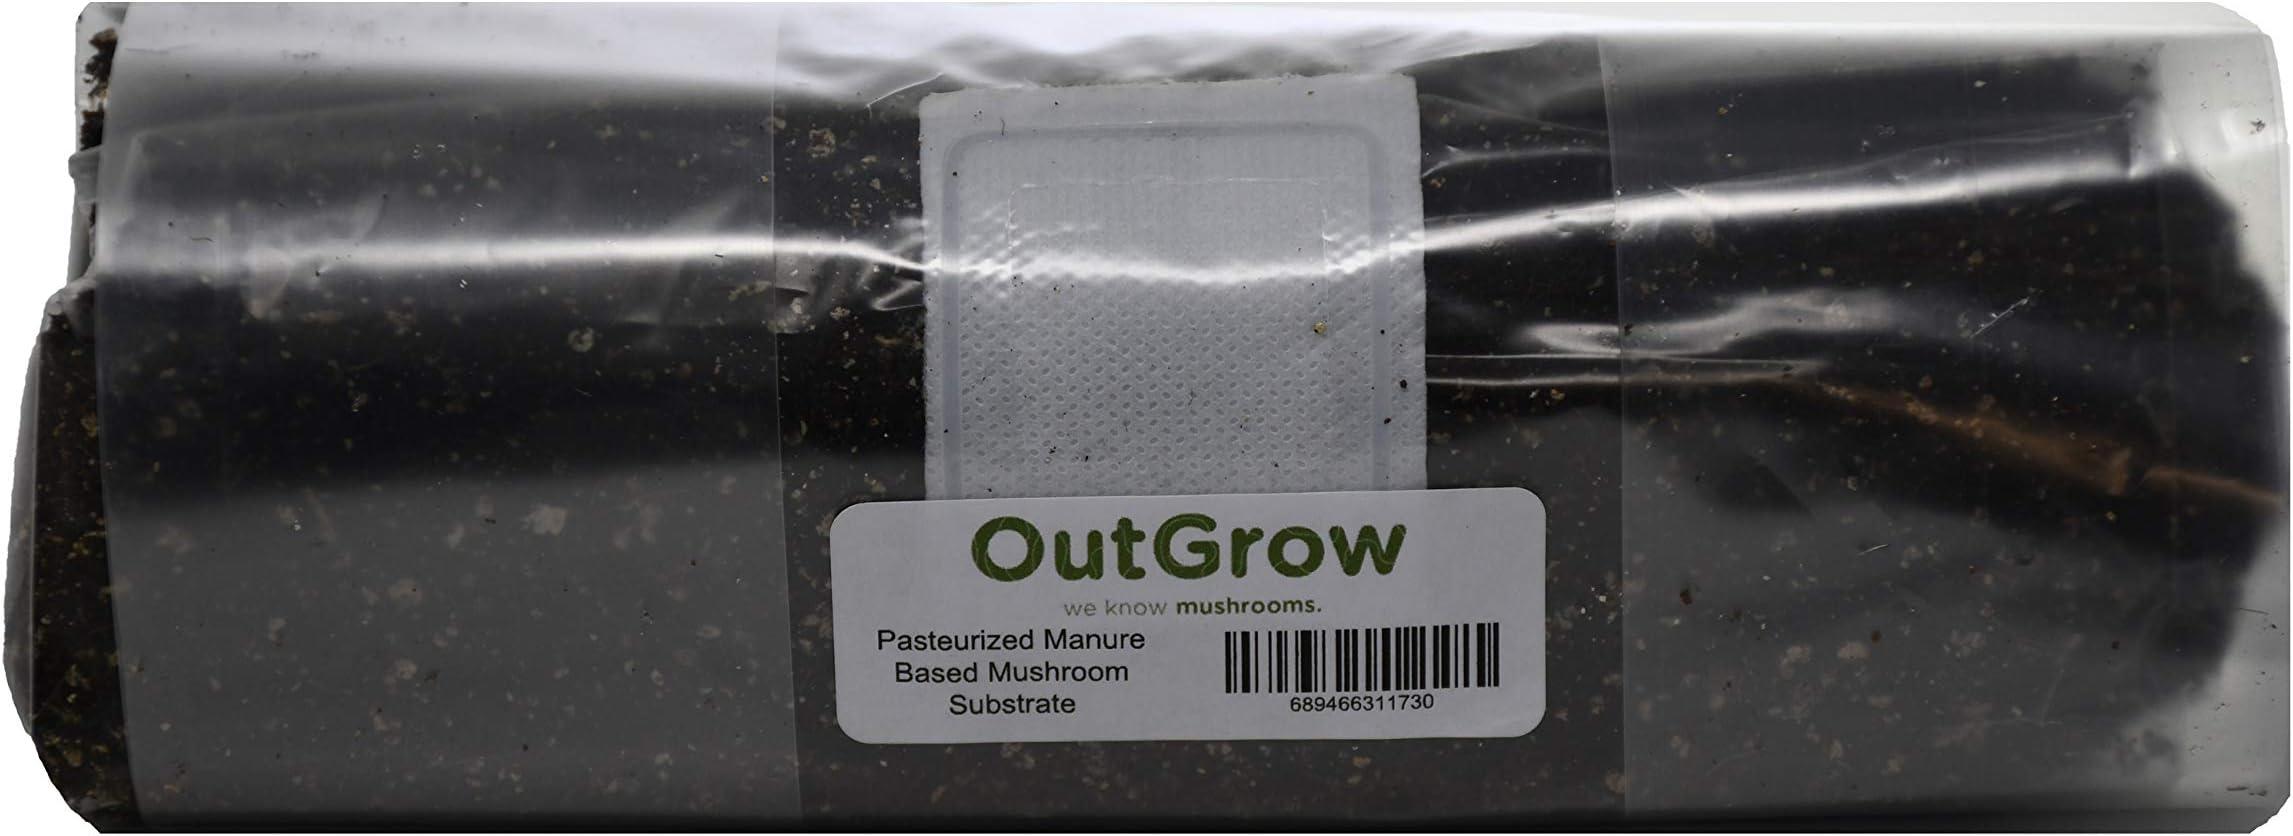 4 lb sterilized manure based mushroom substrate in filter bag.